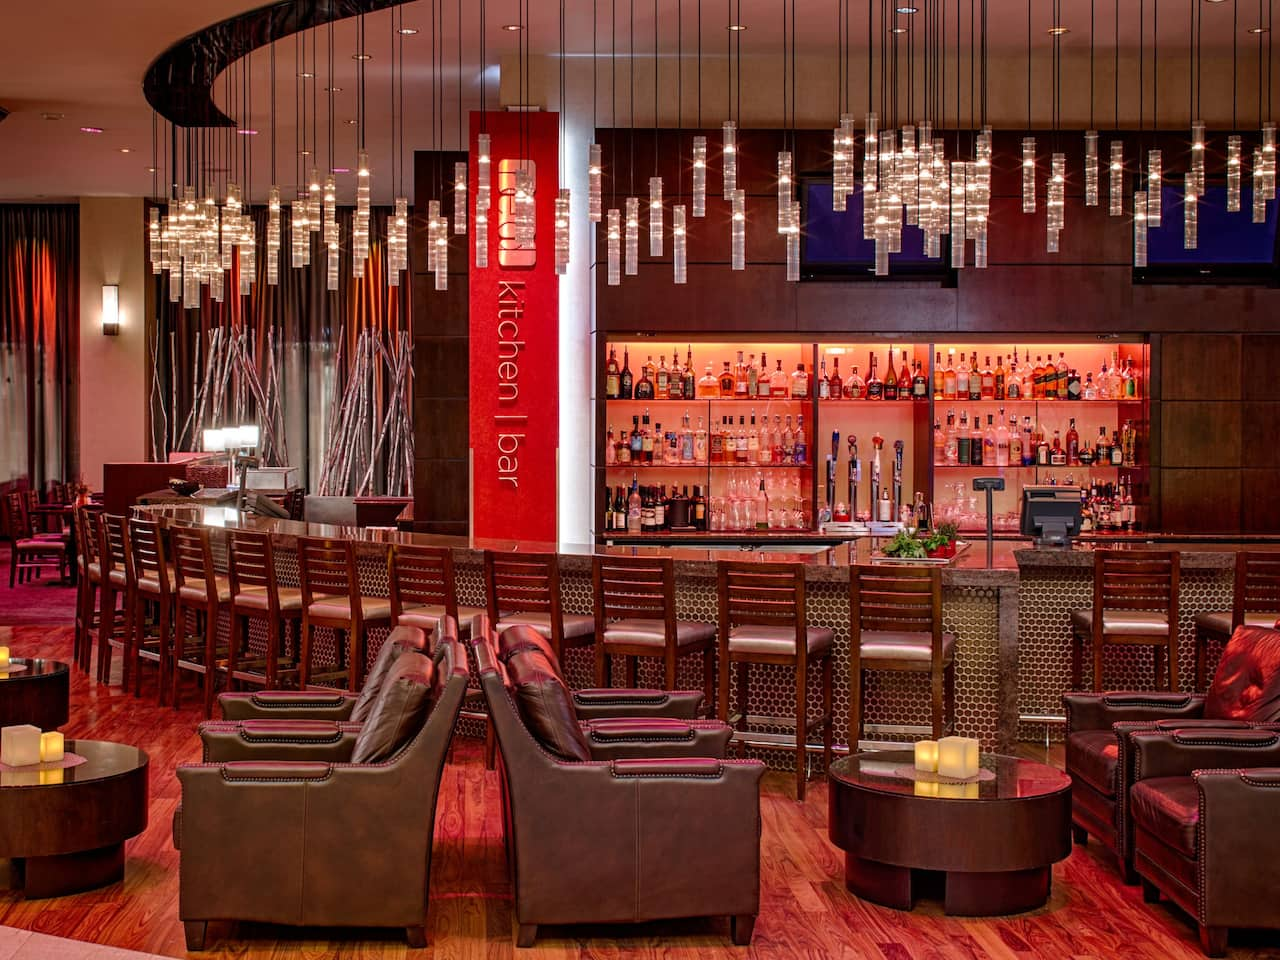 Hyatt Regency St Louis RED Hotel Bar